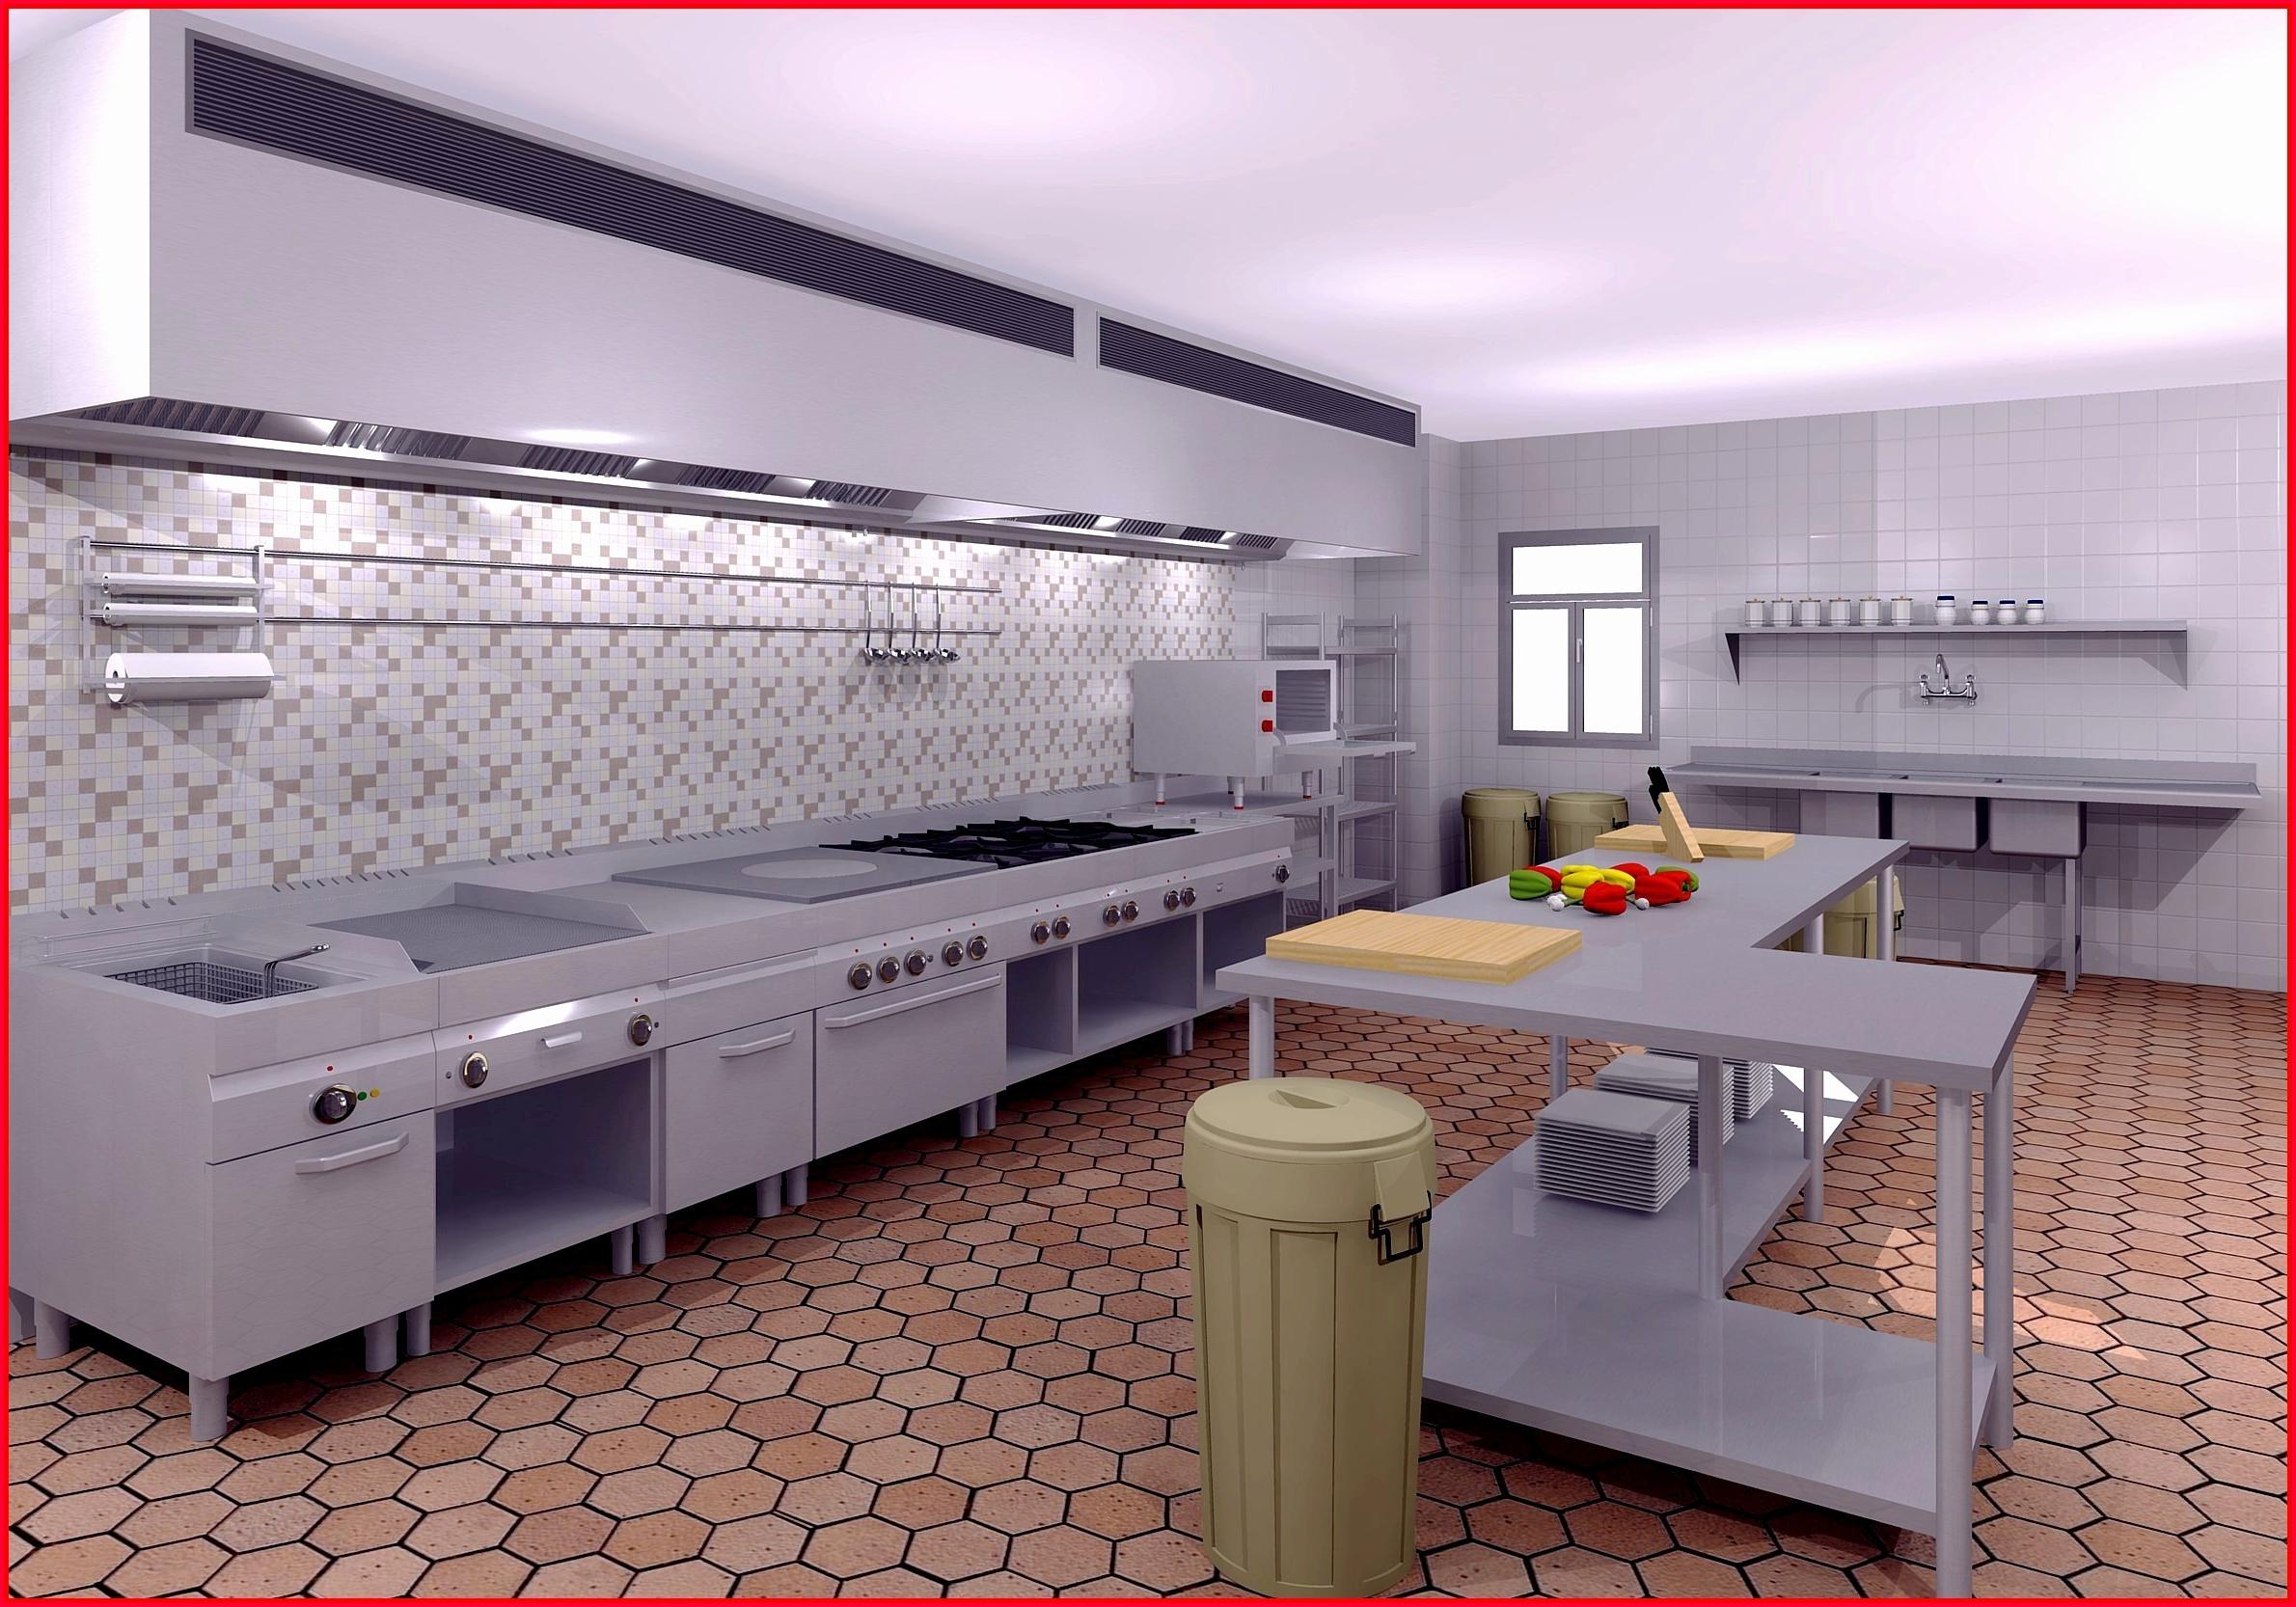 Programa Diseño Muebles 3d Gratis Drdp Diseà O Cocina 3d DiseO De Cocinas Gratis Best Programa Dise